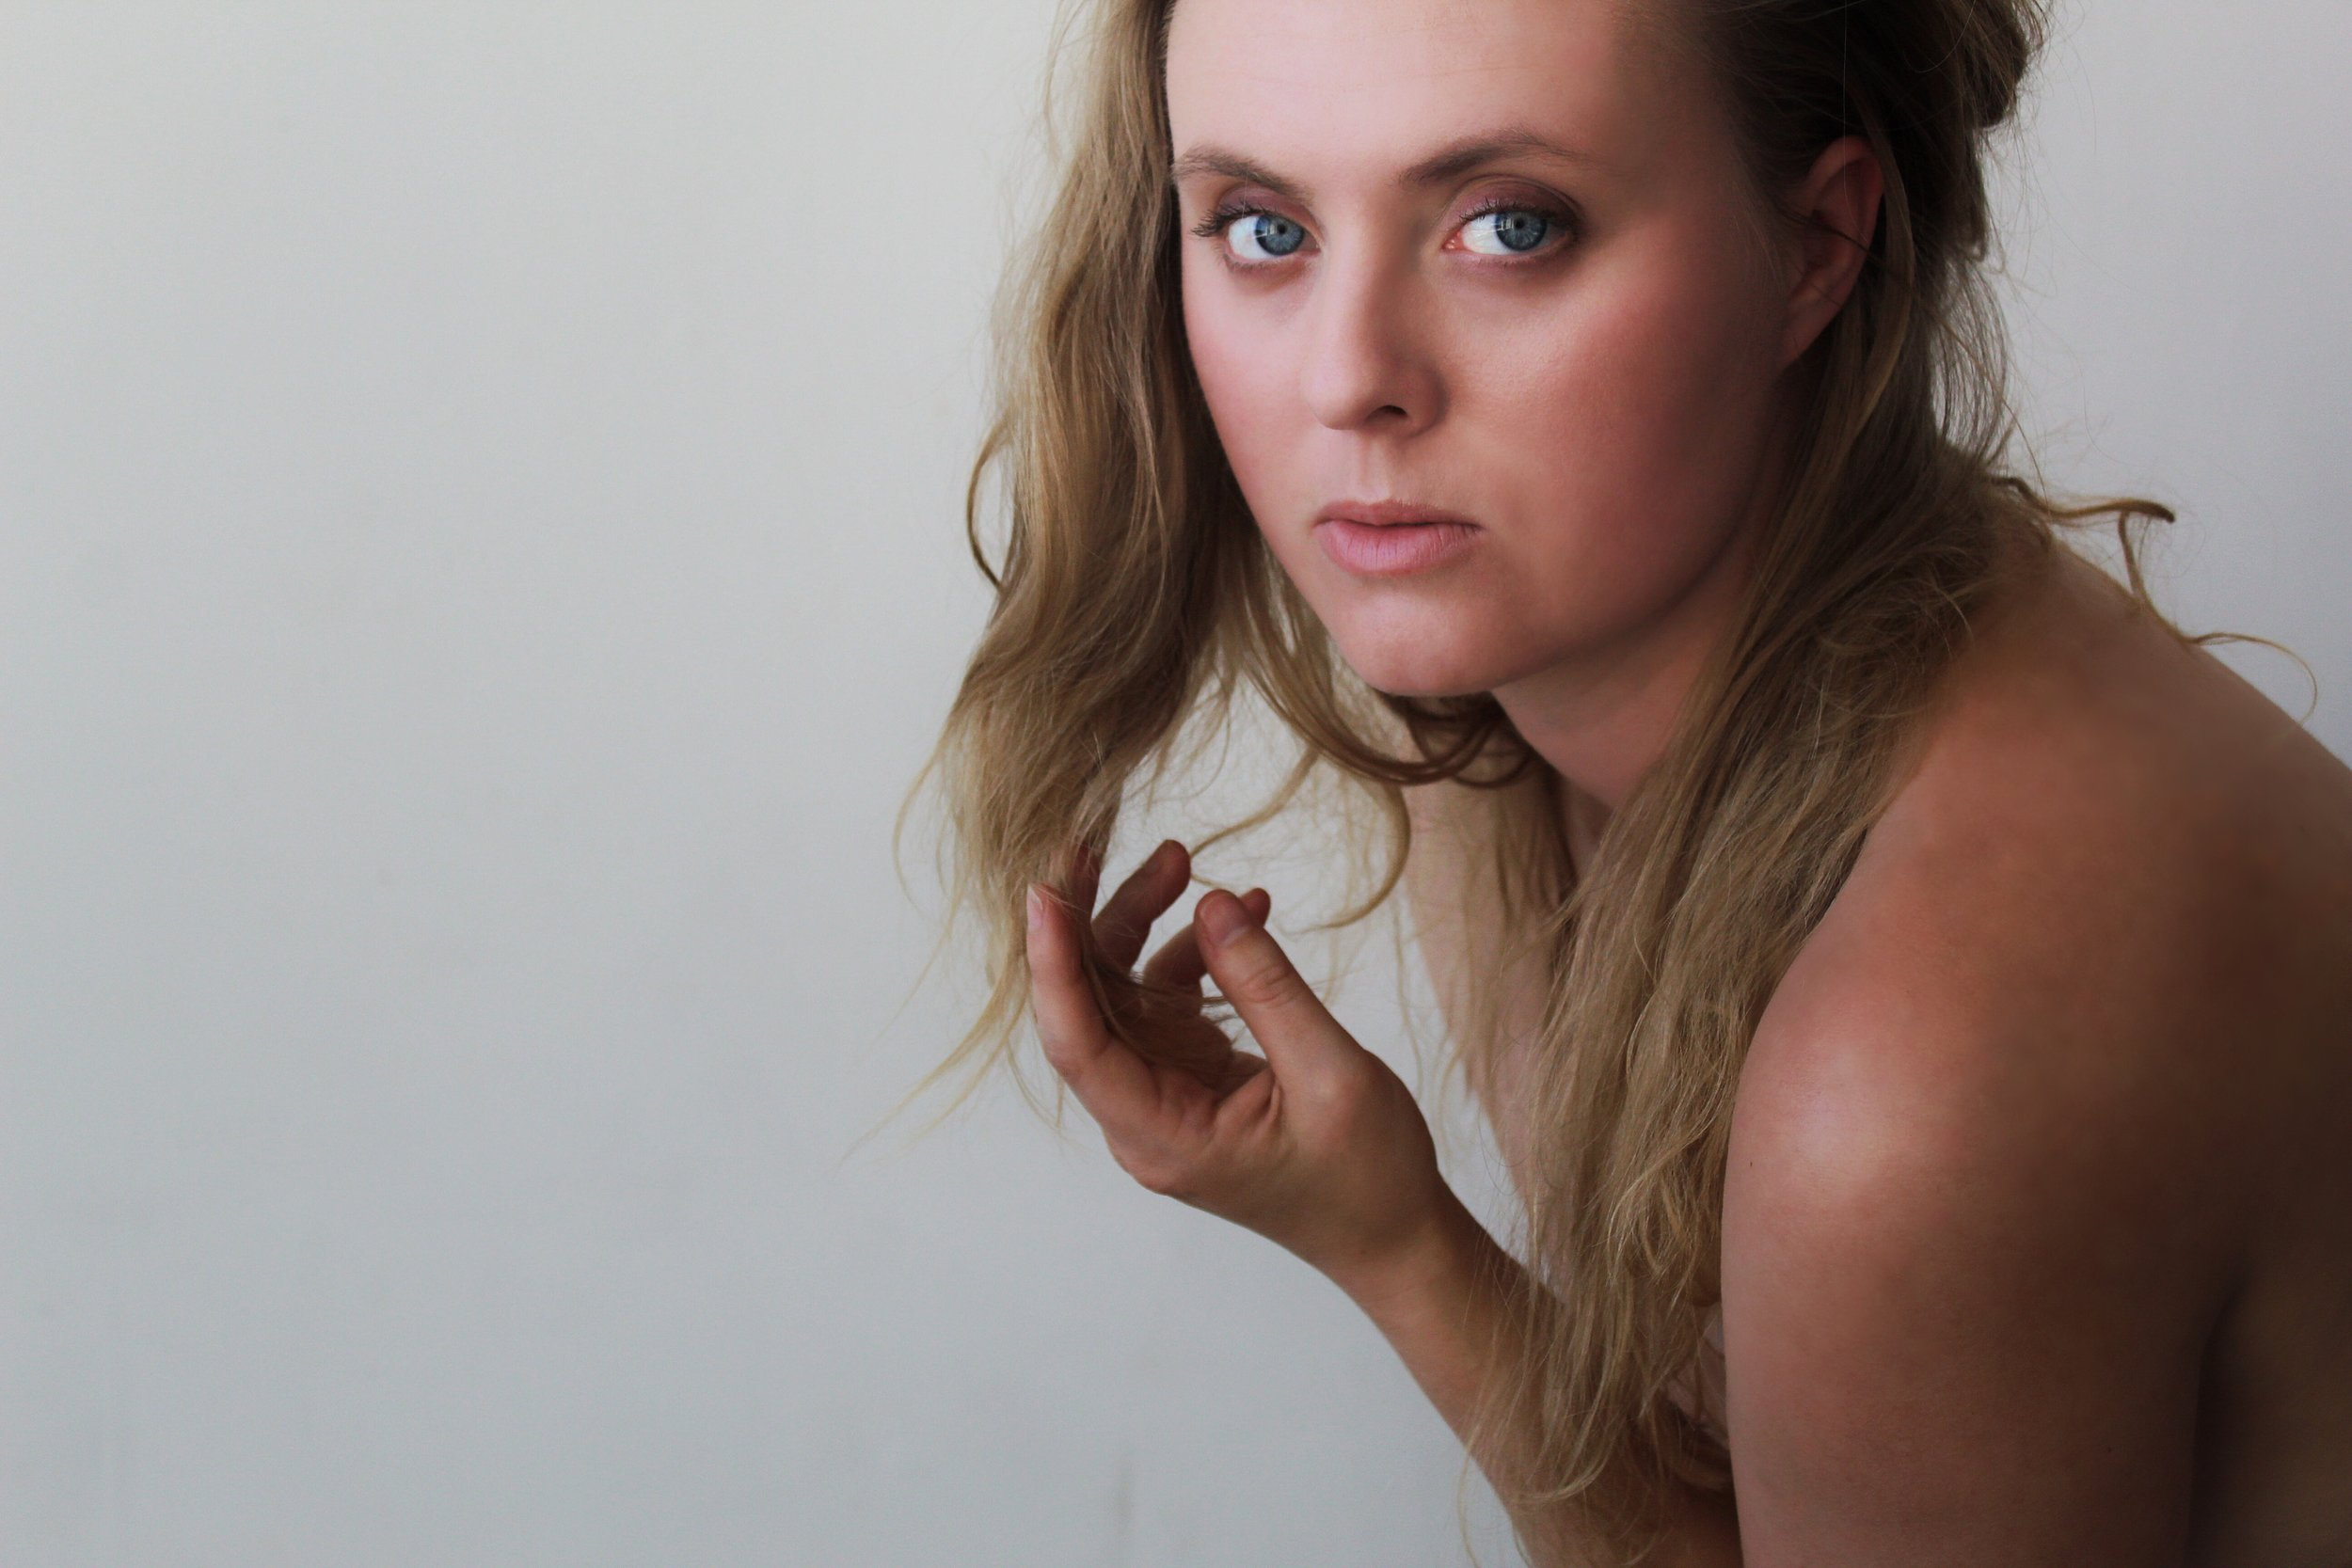 embody-sensual-photography-navae-lukas.jpg